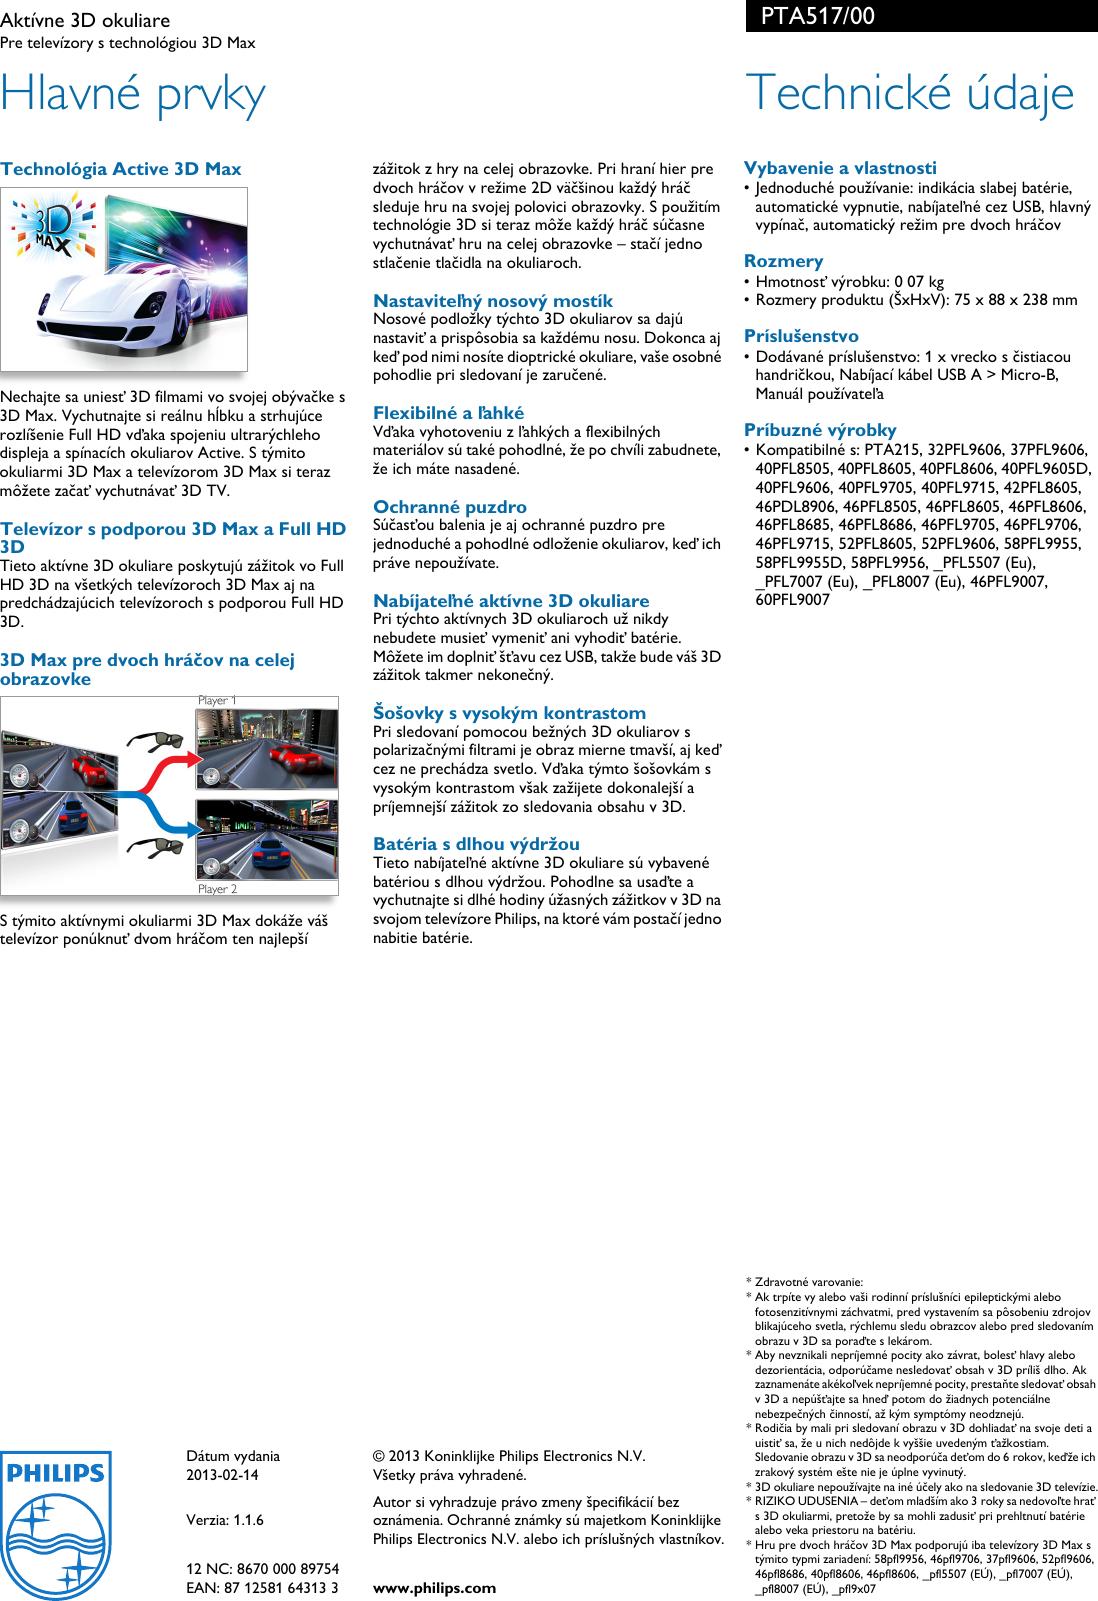 460fb920c Page 2 of 2 - Philips PTA517/00 Aktívne 3D Okuliare User Manual Prospekt  Pta517